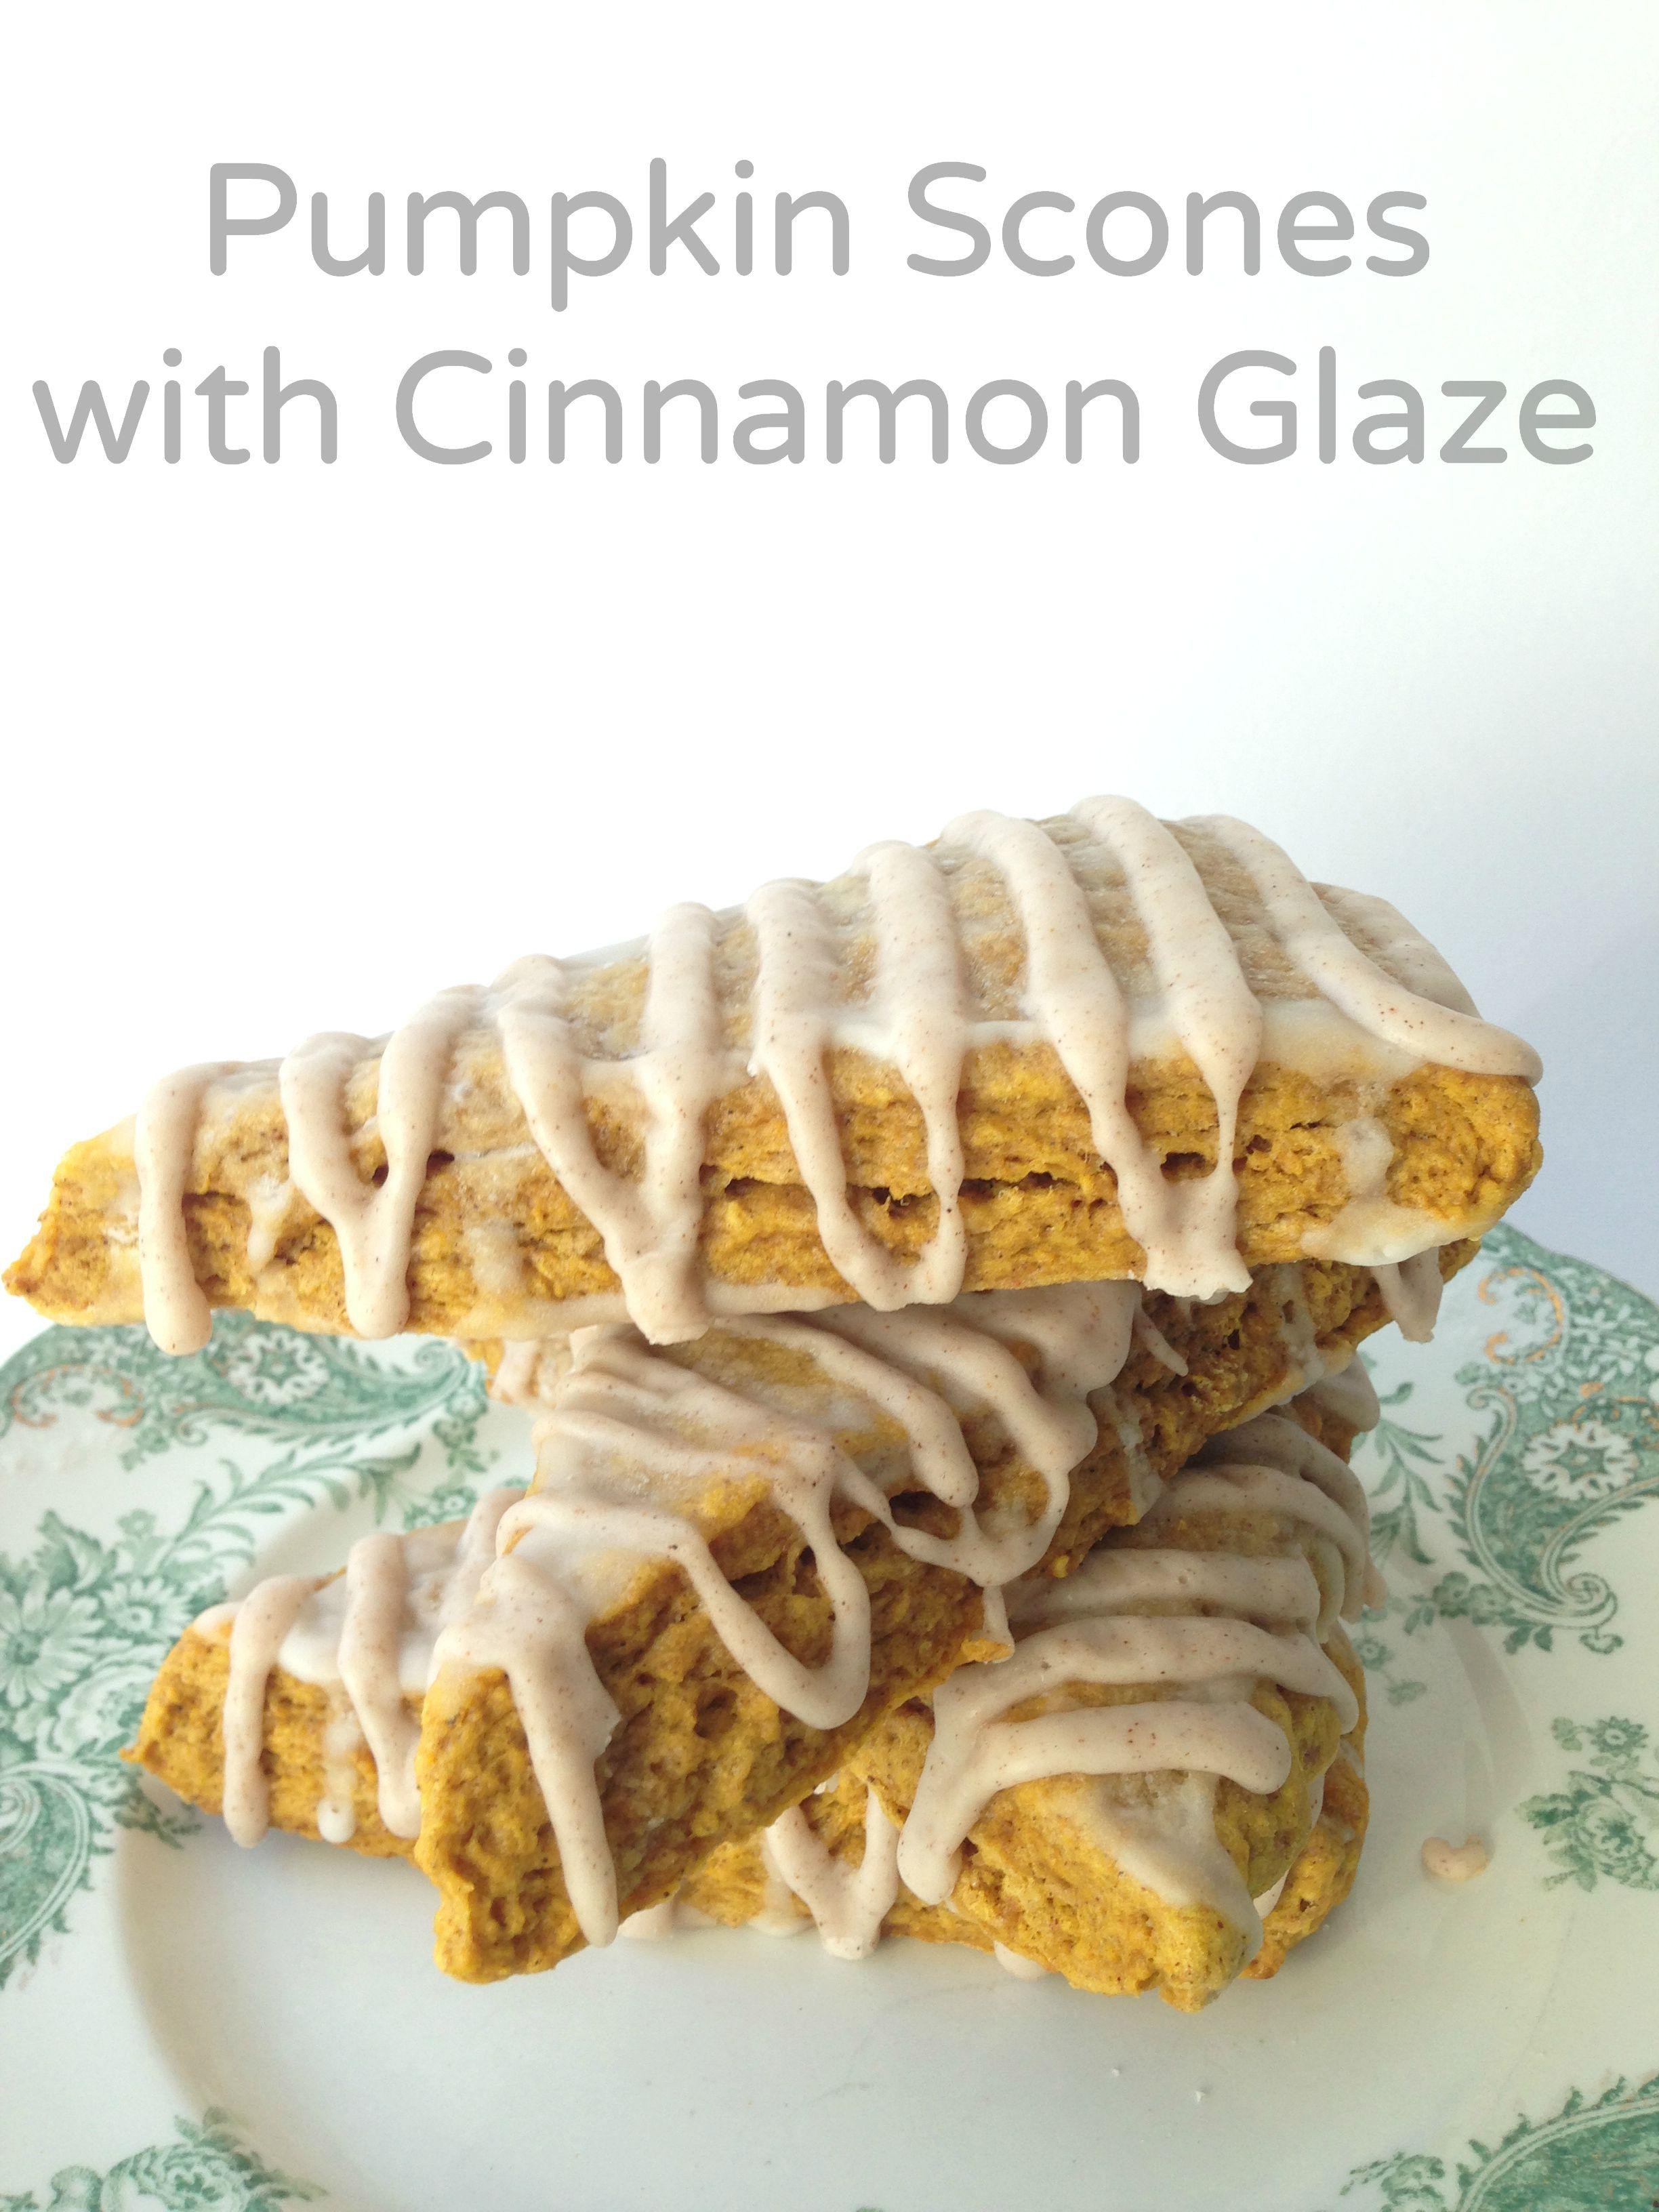 pumpkin scones with cinnamon glaze